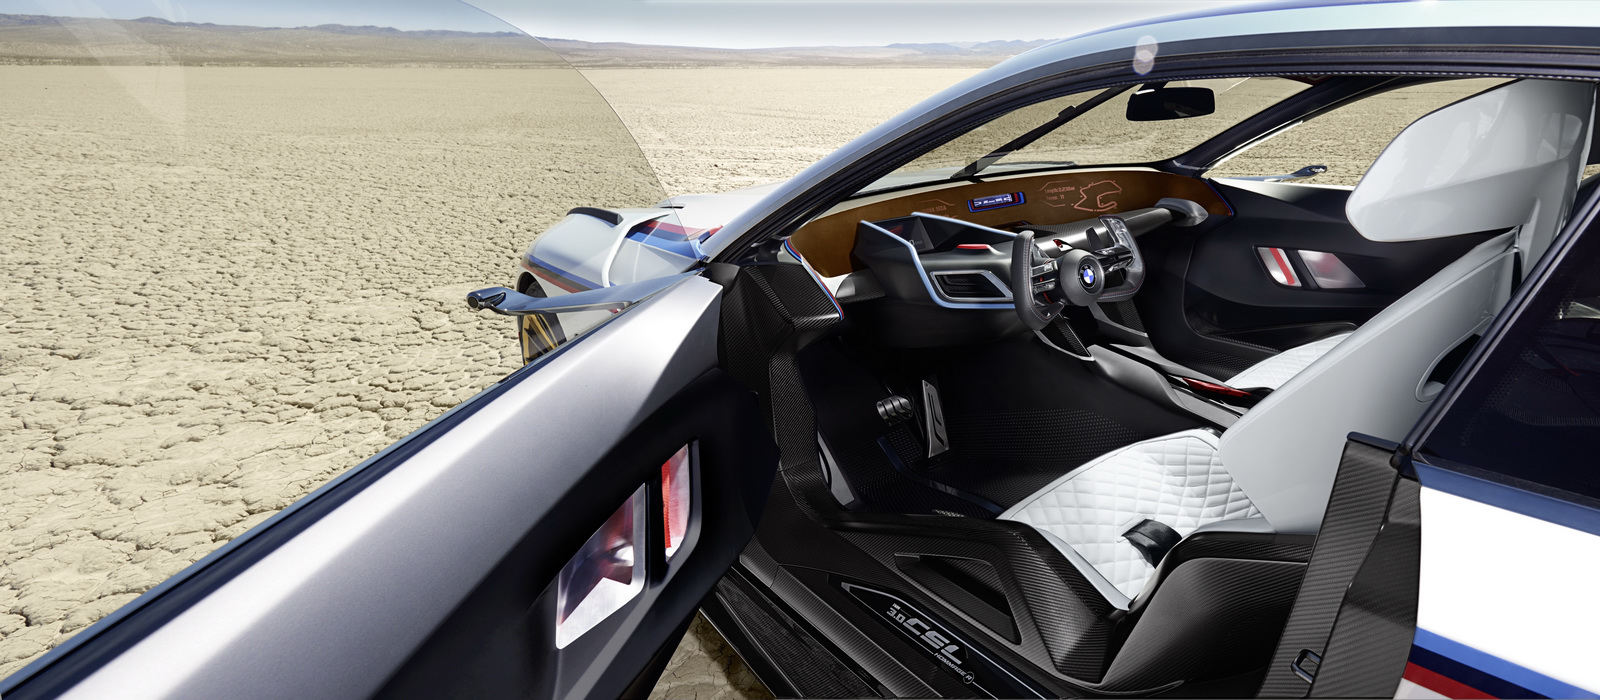 BMW-30-Hommage-R-Concept-24